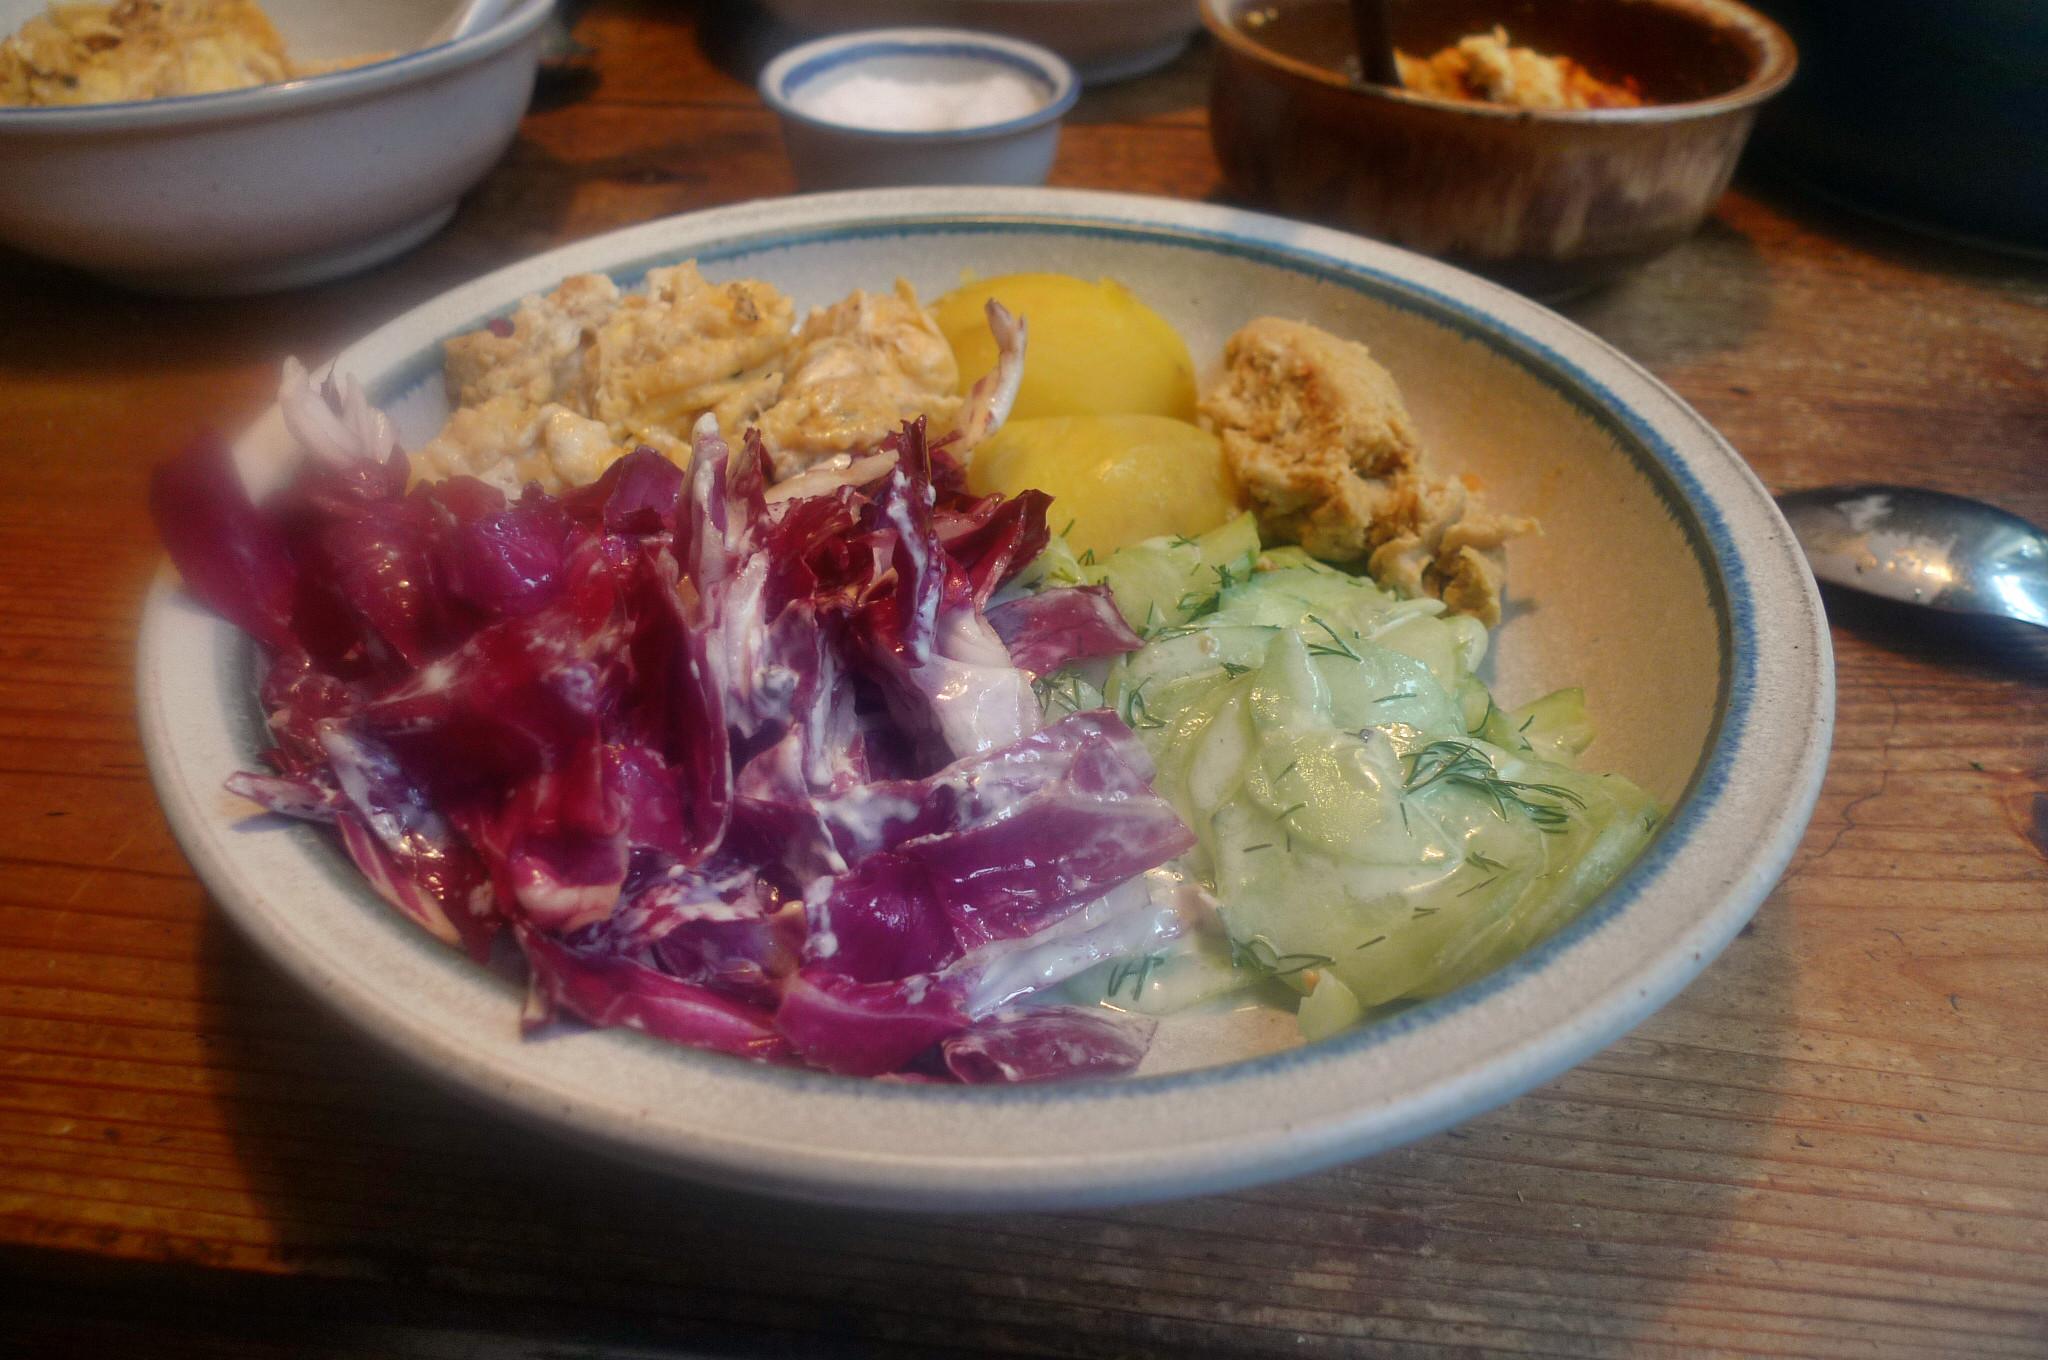 Kartoffel,Rührei,Salate,Humus -17.10.14   (8)